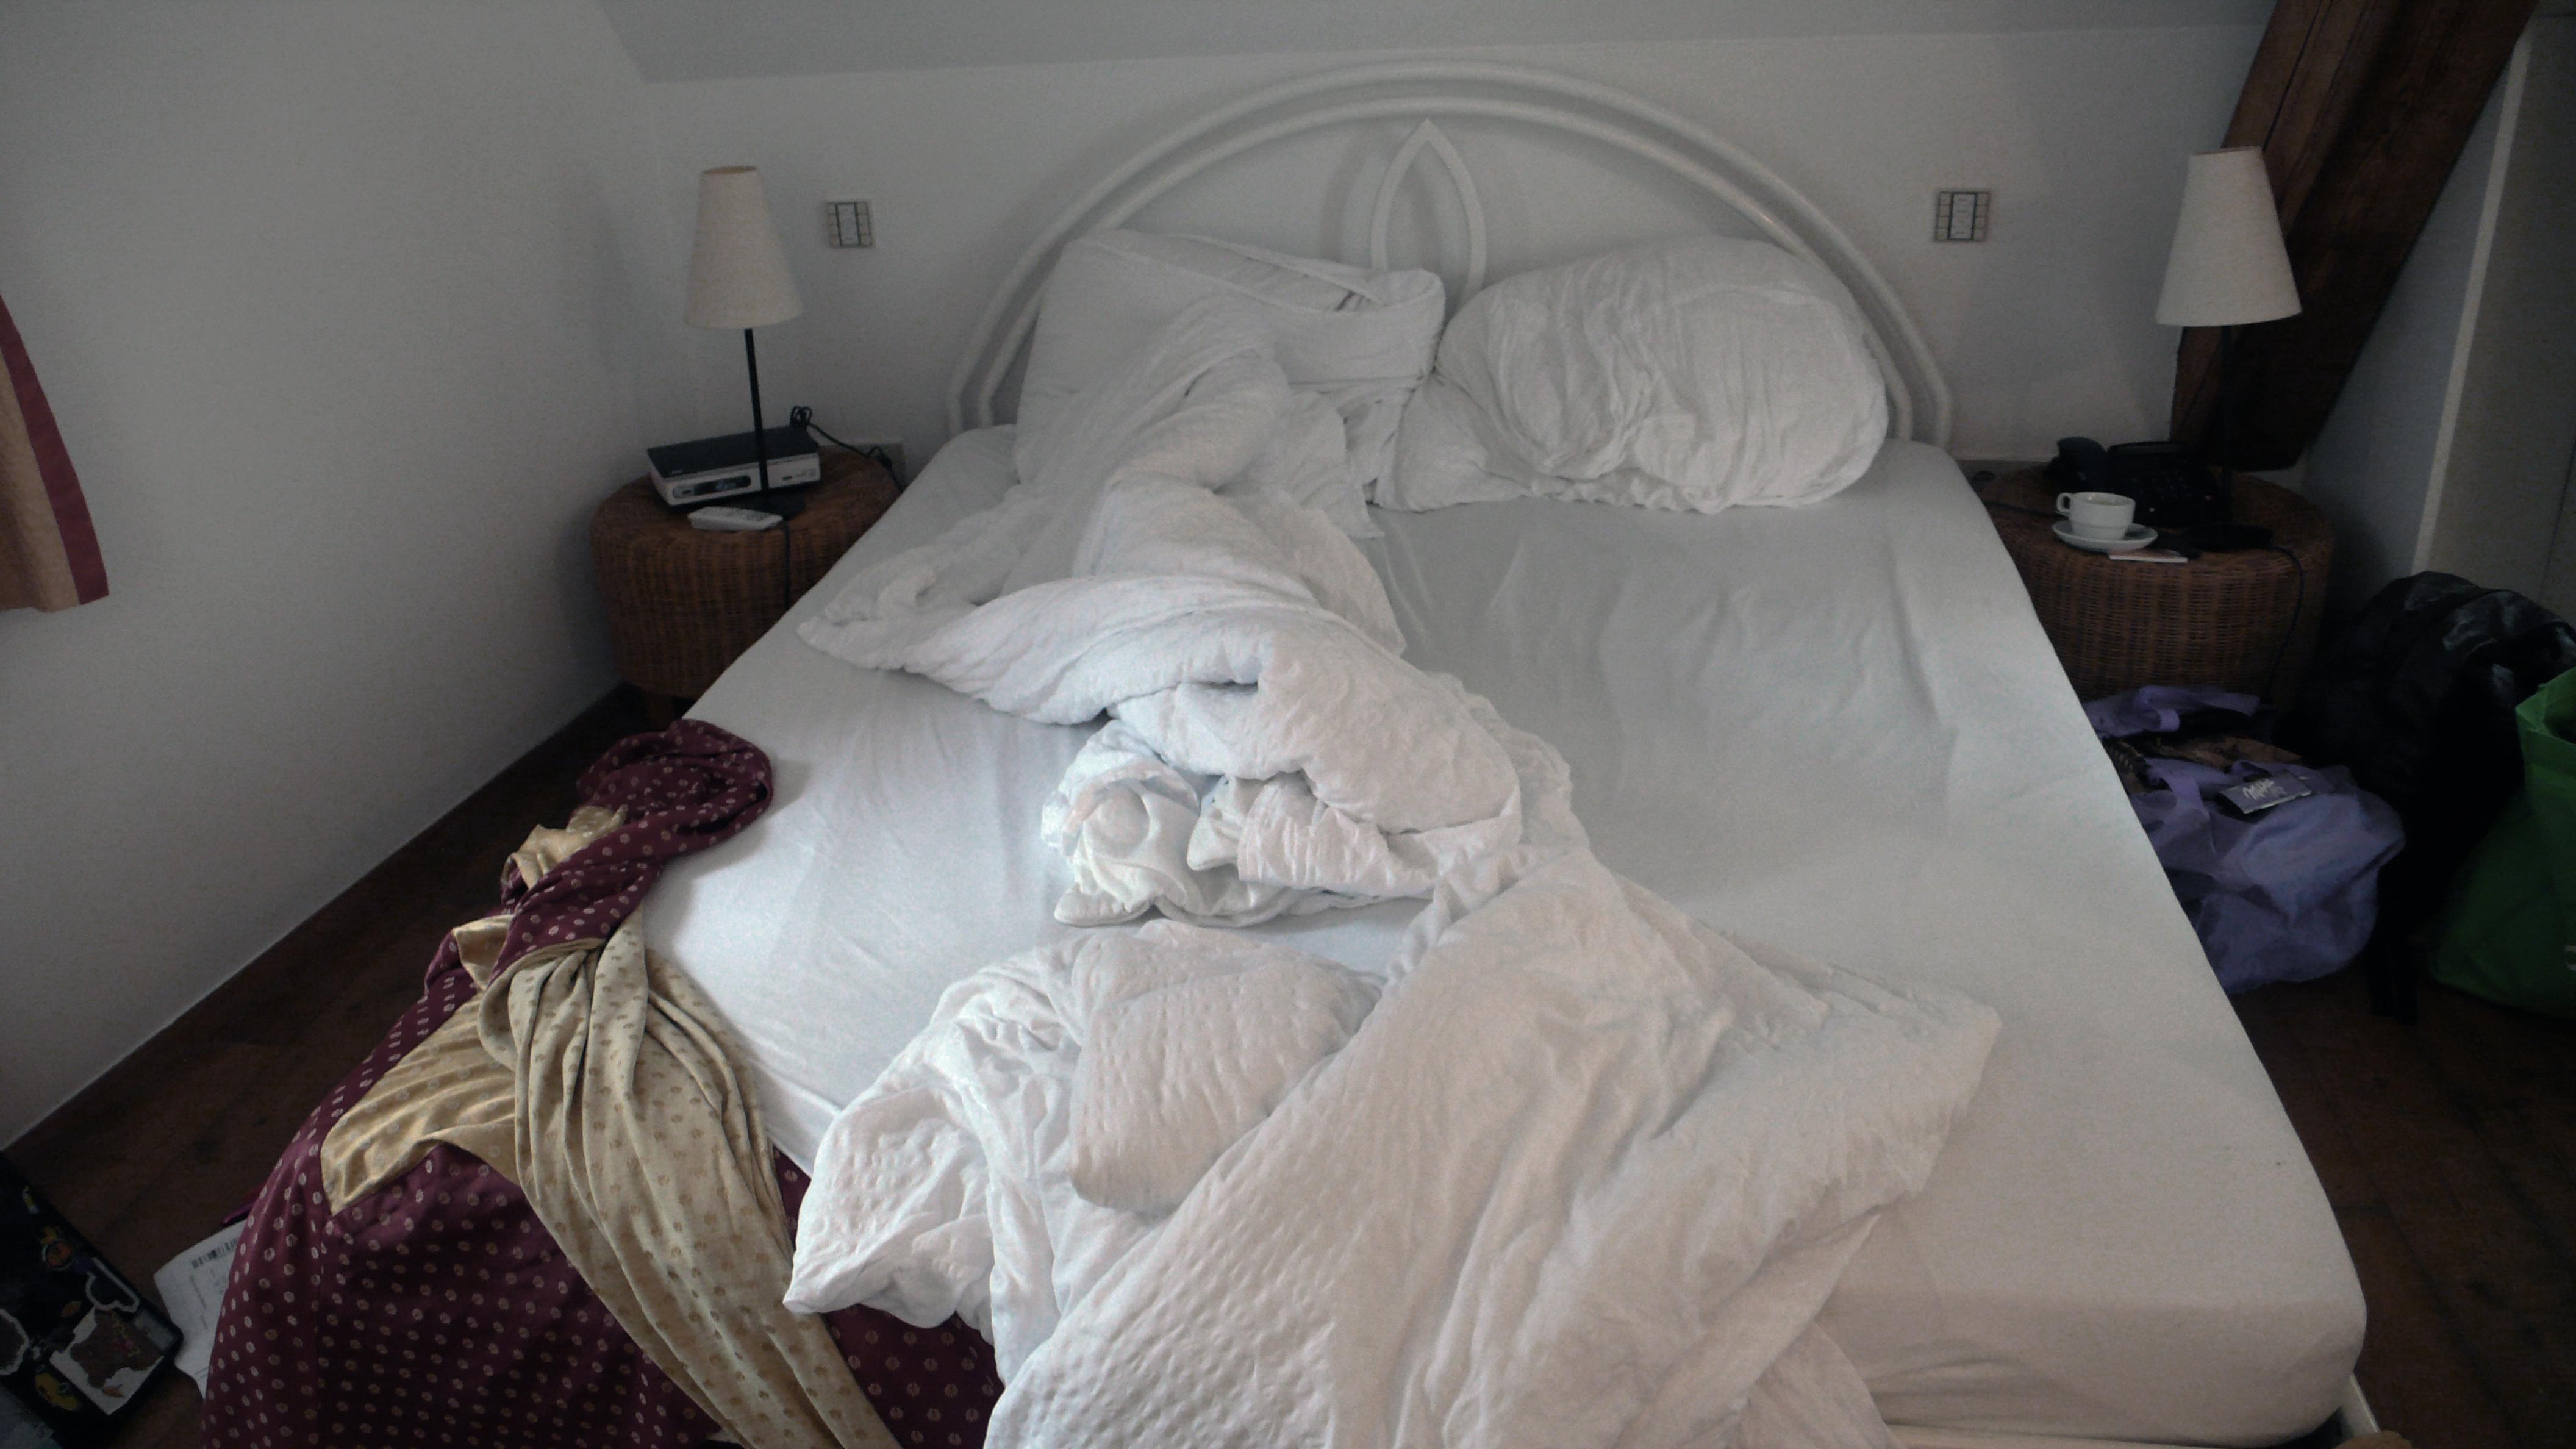 interior landscapes, Leyla Rodriguez, isle of lox, homeless, leylox